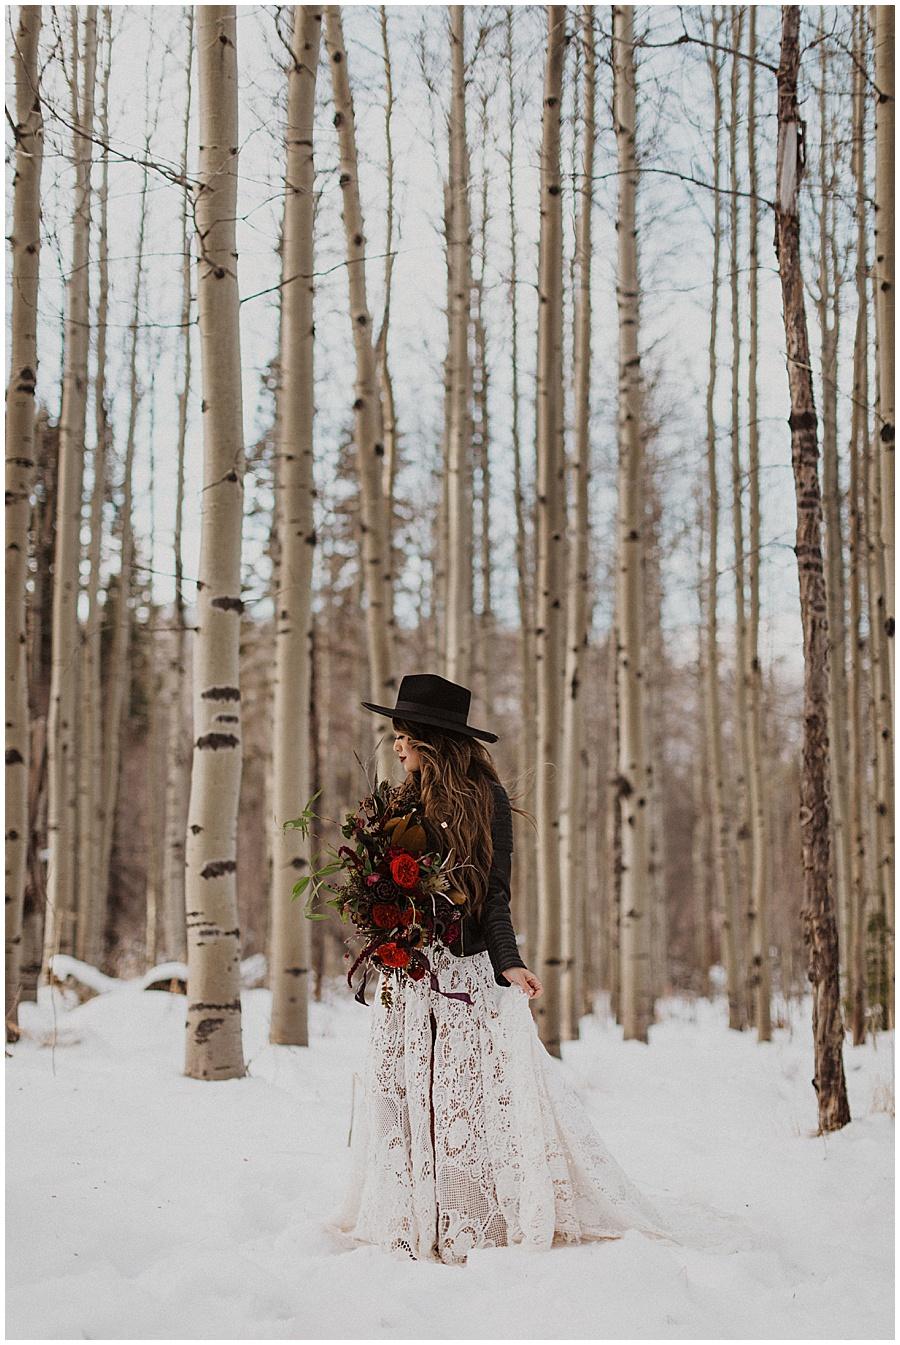 Meg's Marvels Photography - Tahoe & Truckee Adventurous Snowy Elopement_0250.jpg